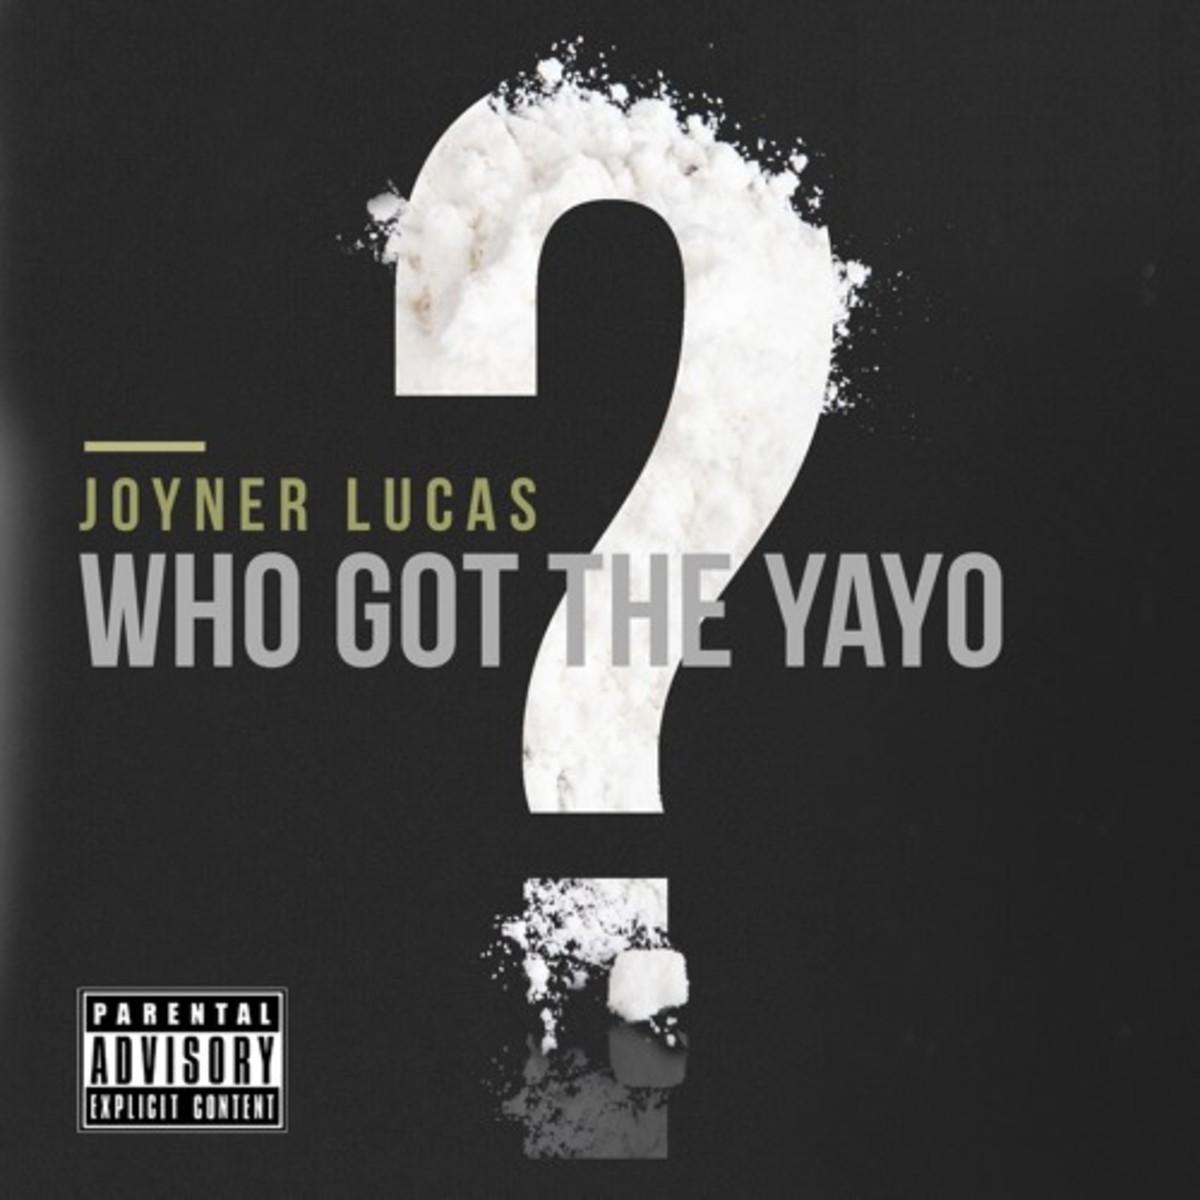 joyner-lucas-who-got-the-yayo.jpg